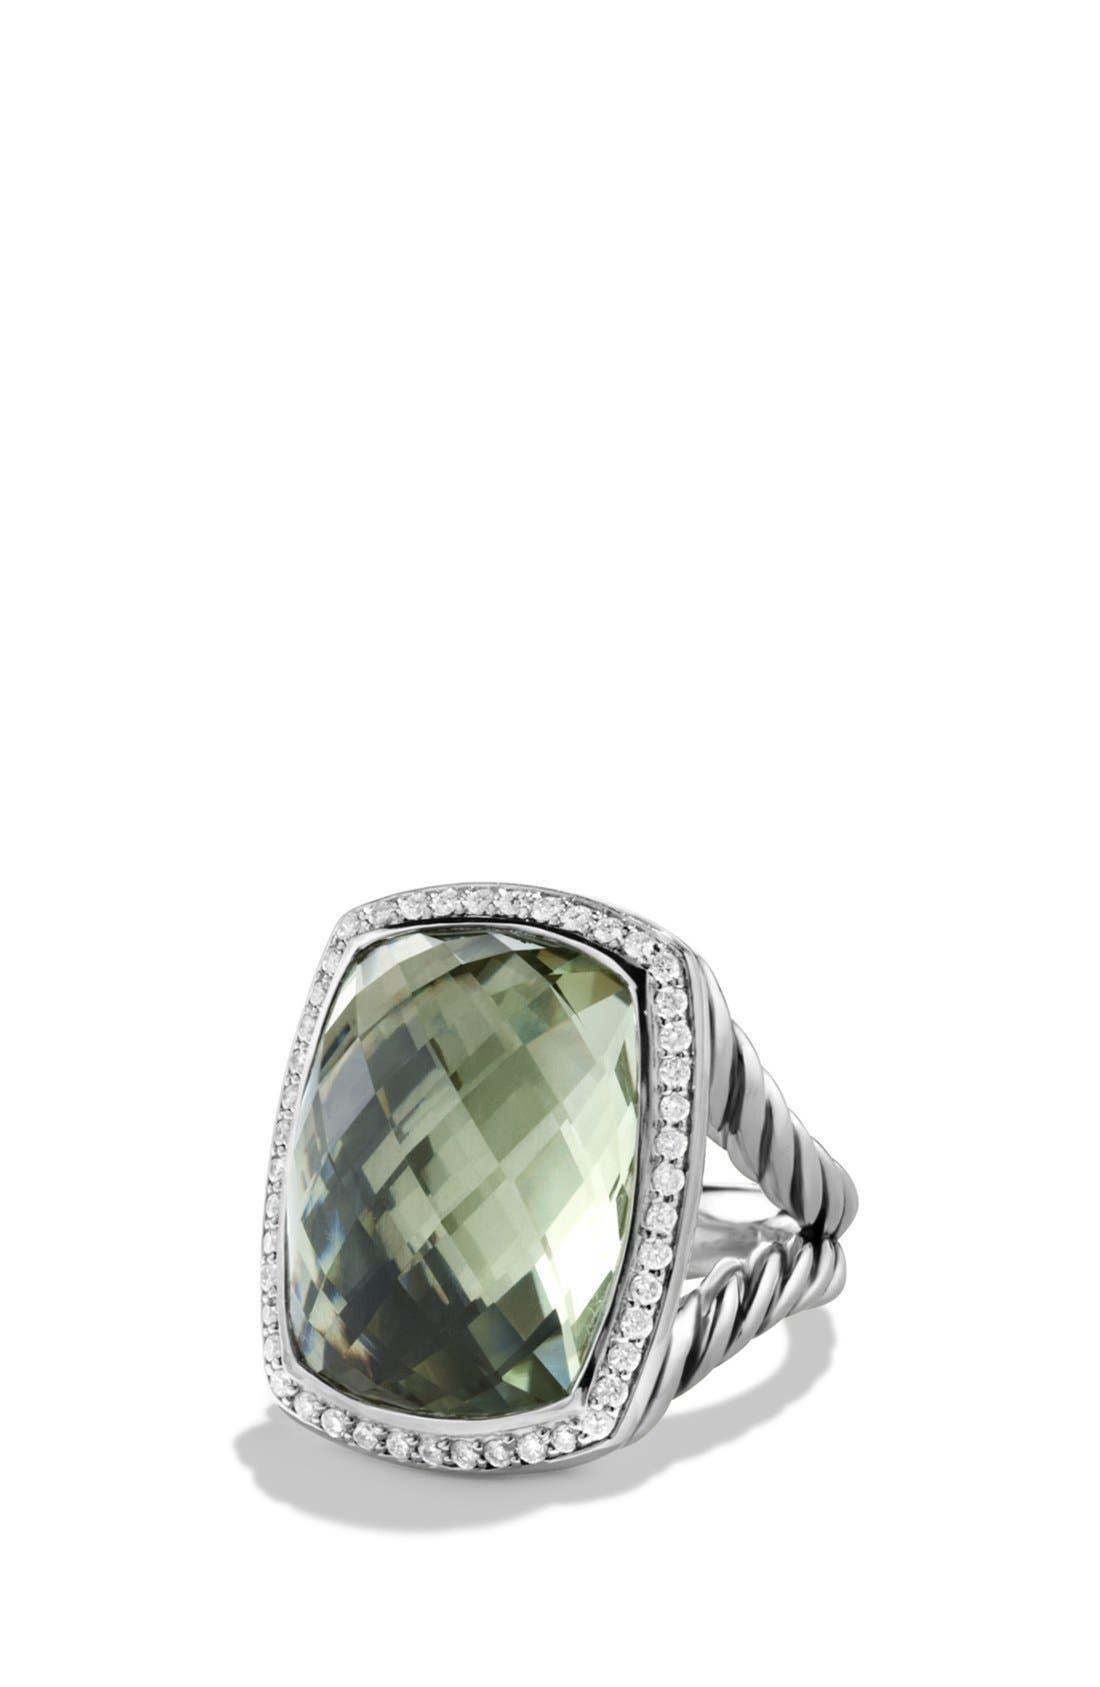 DAVID YURMAN 'Albion' Ring with Diamonds